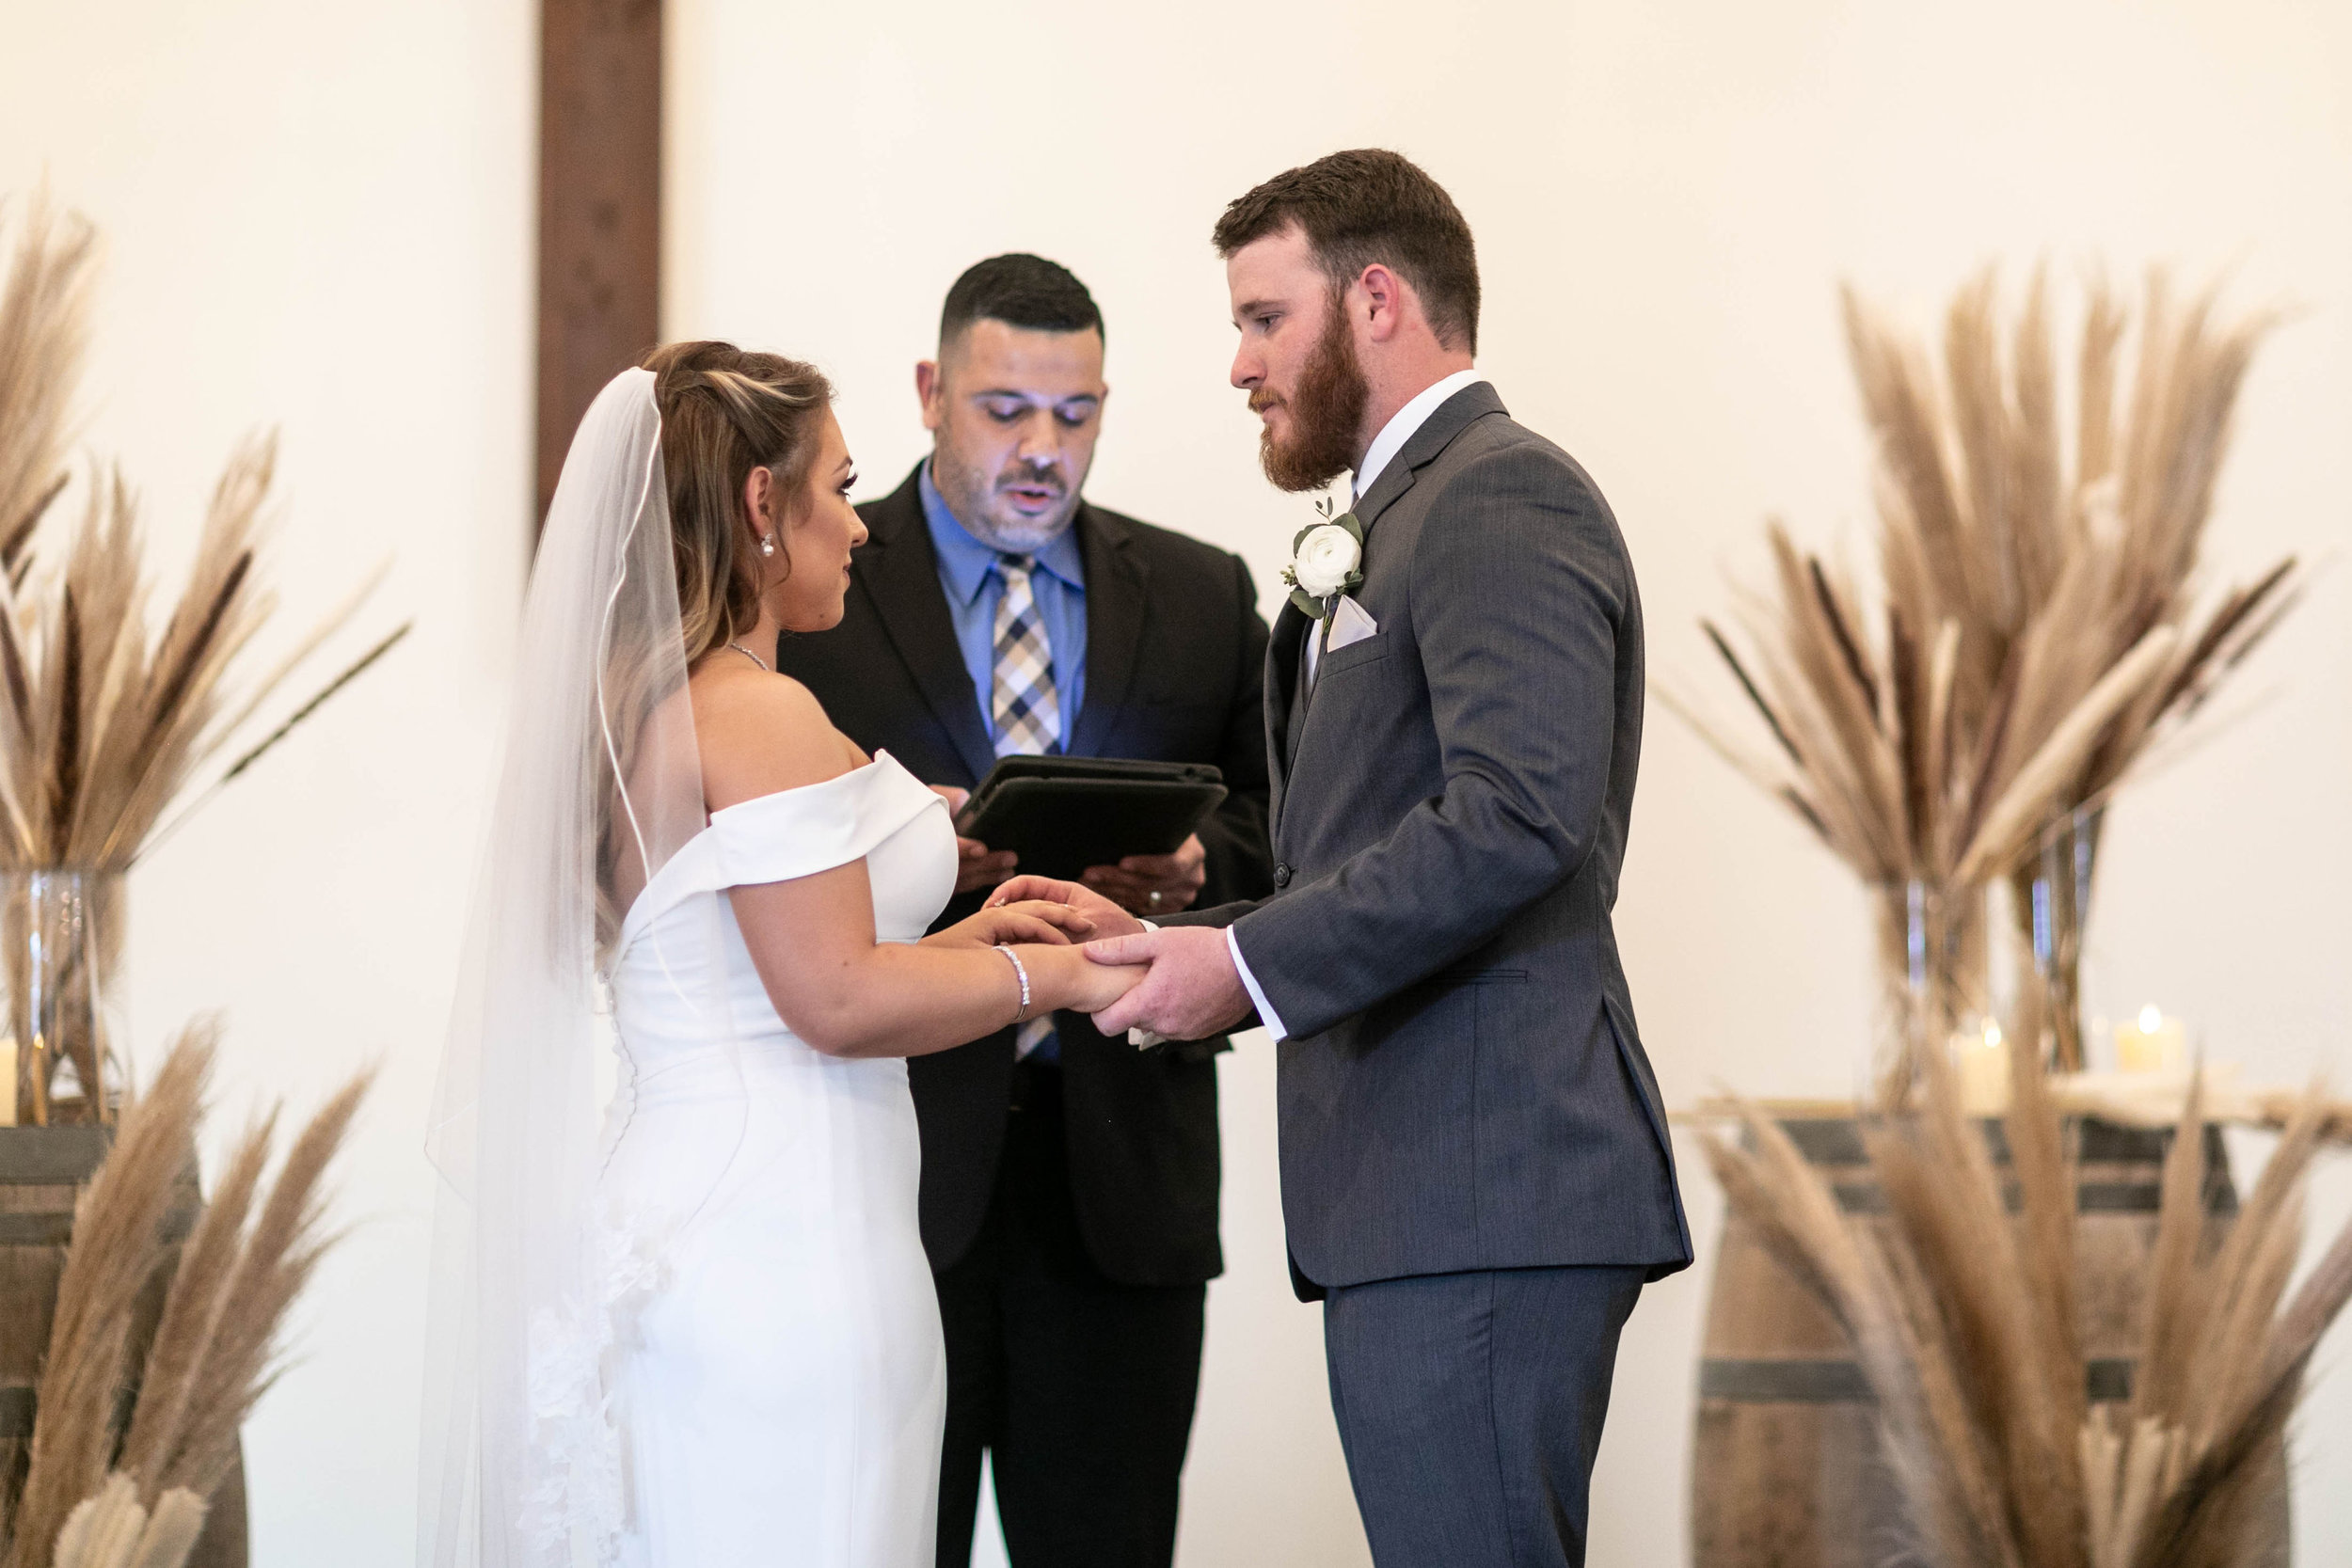 Bride and Groom Ceremony | The Vine | Austin Planner